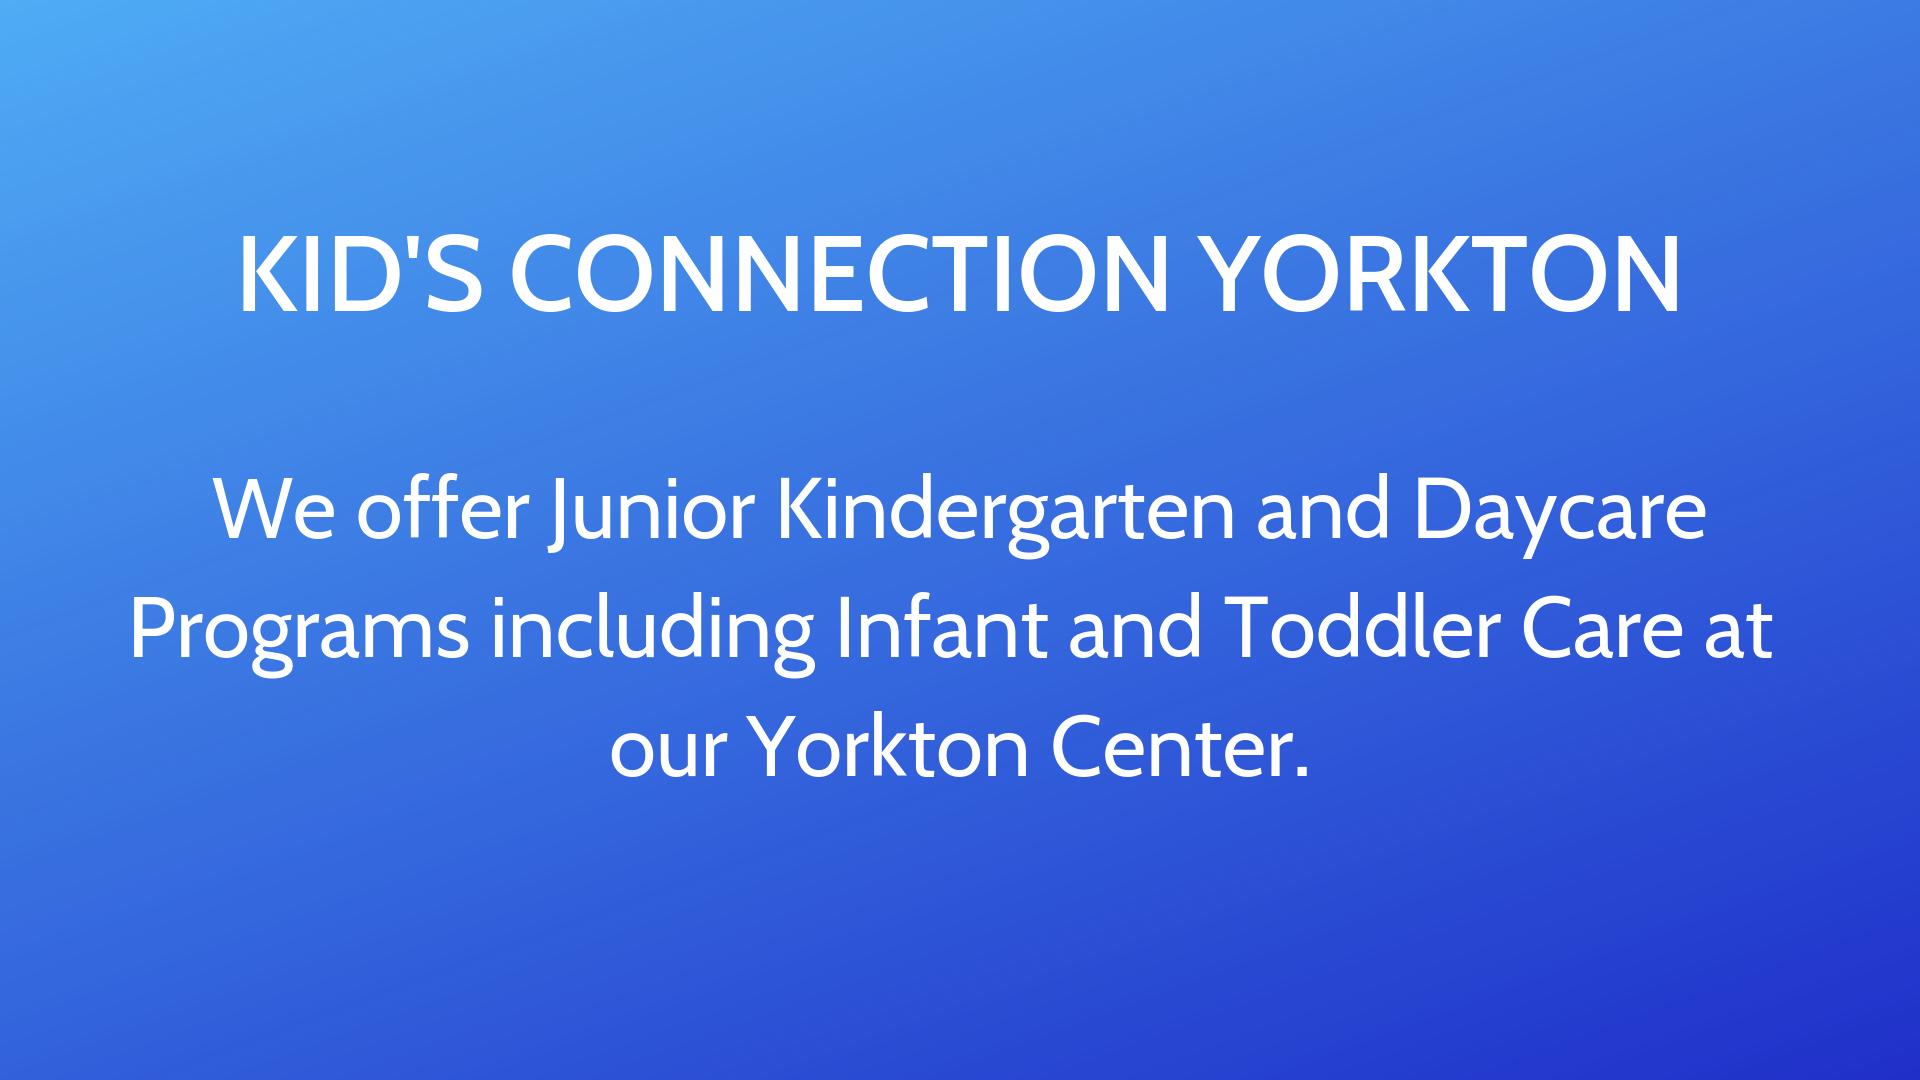 Kid's Connection Yorkton